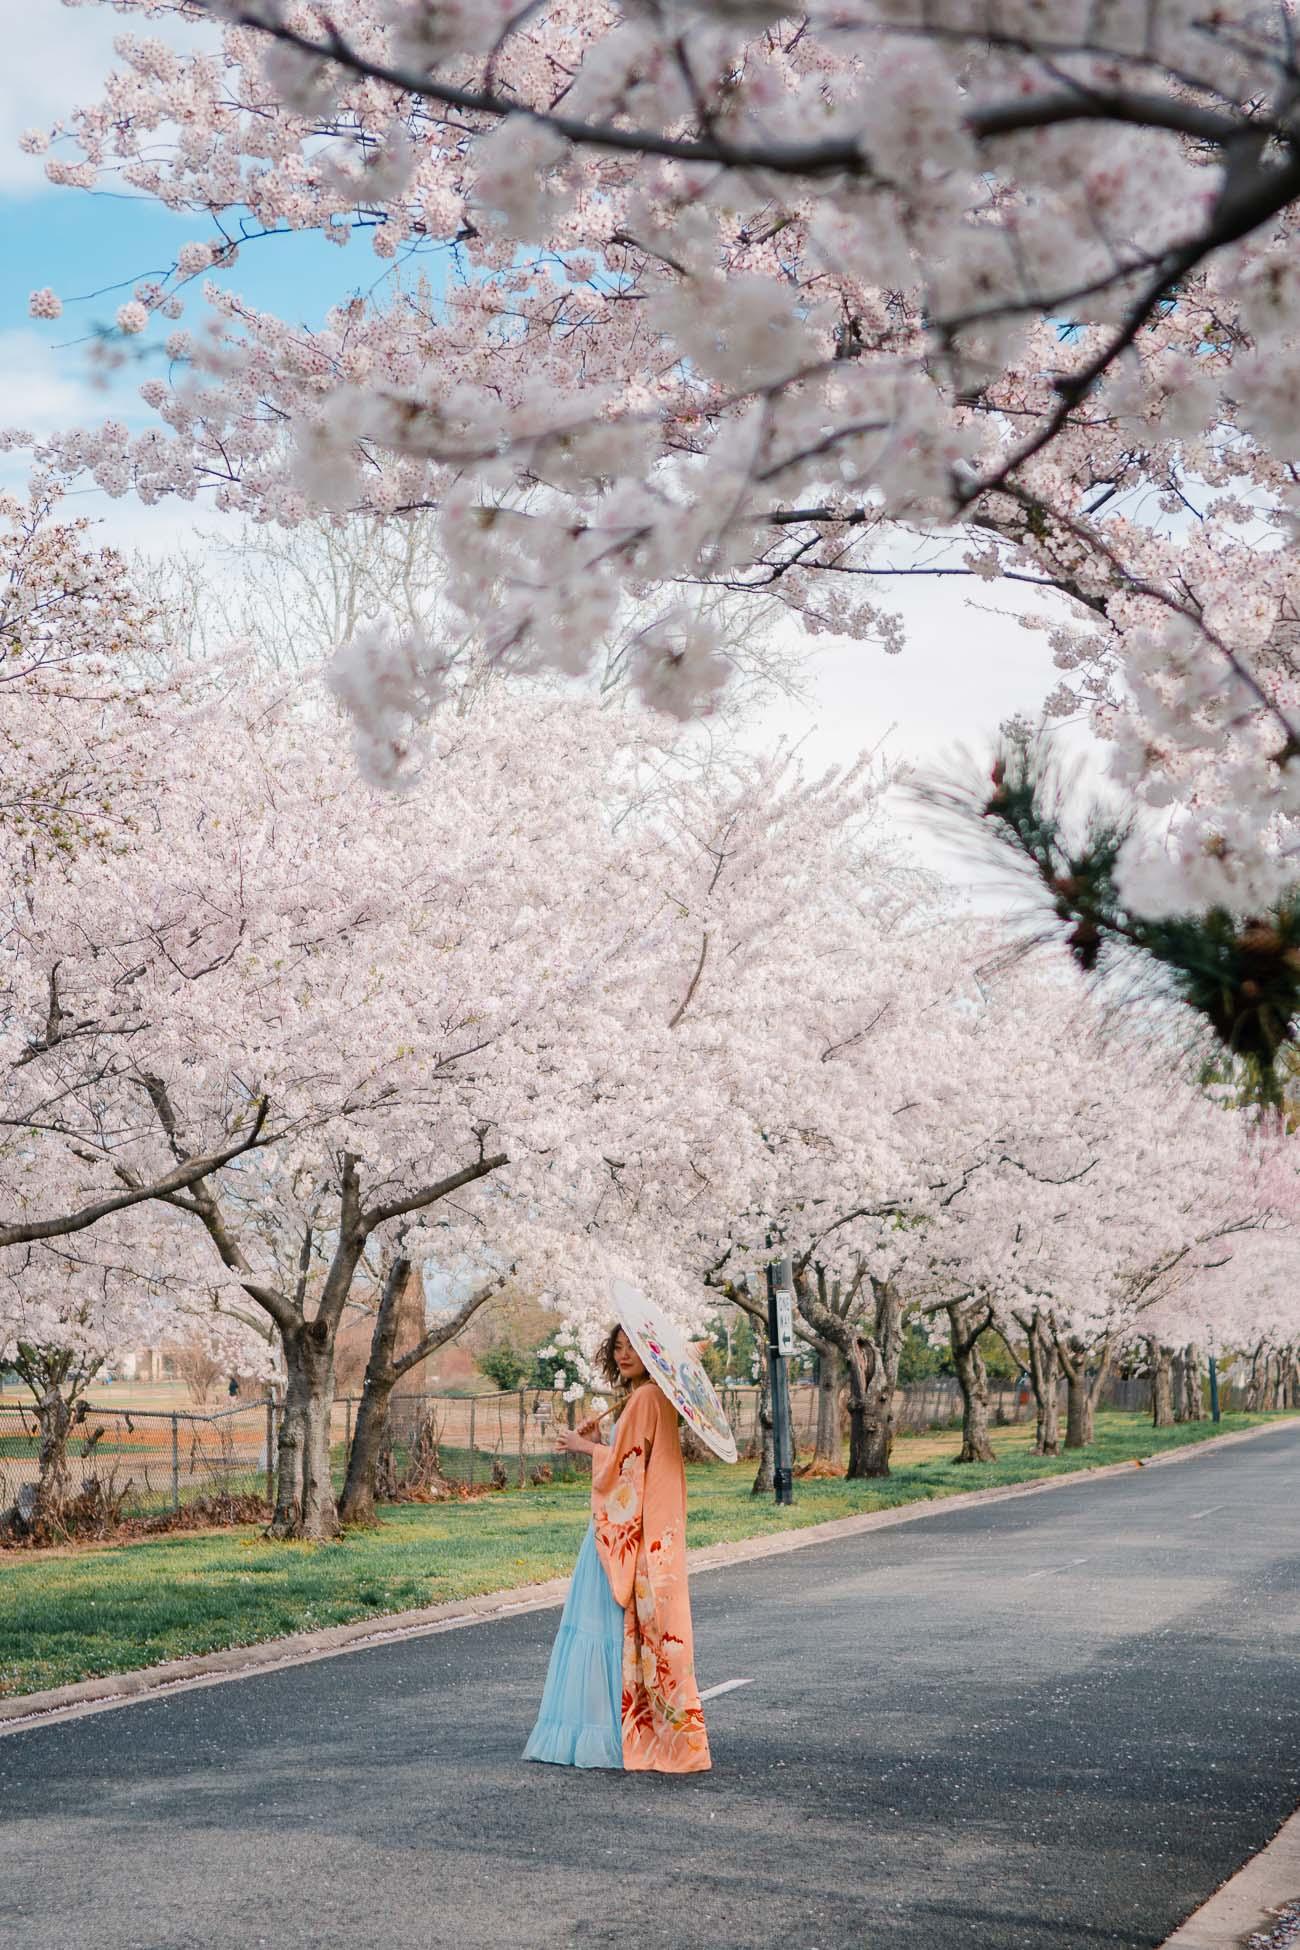 The 2021 Guide To Washington Dc Cherry Blossom Peak Bloom